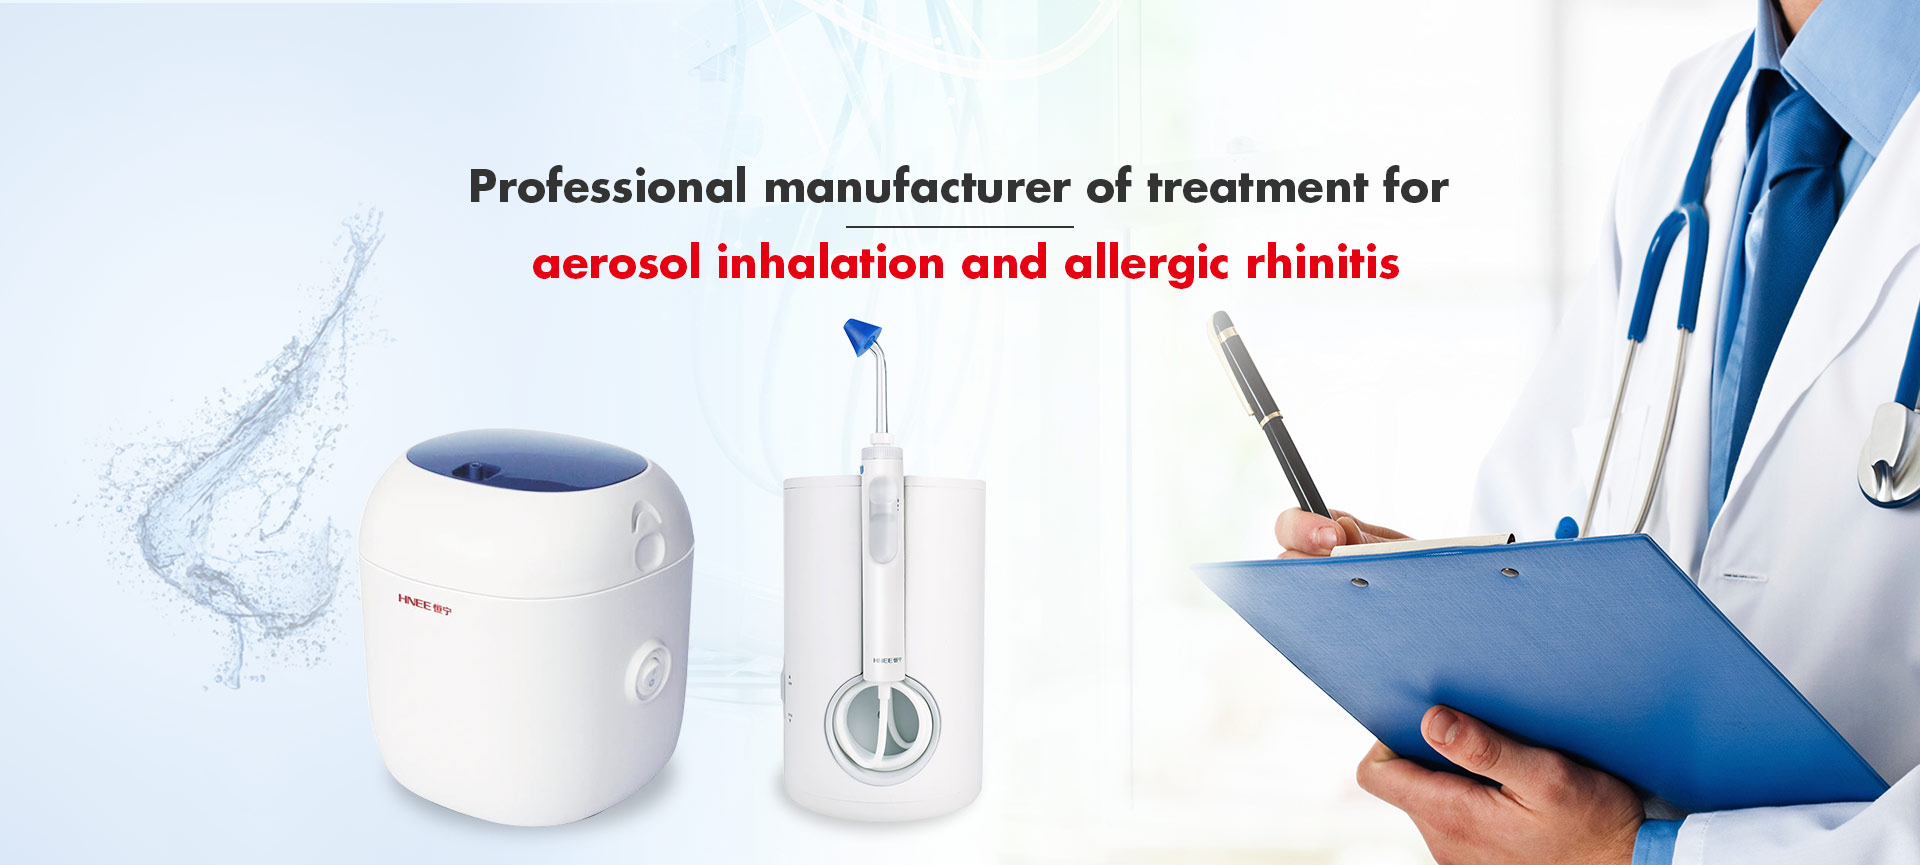 Nebulizer and Nasal Irrigator System